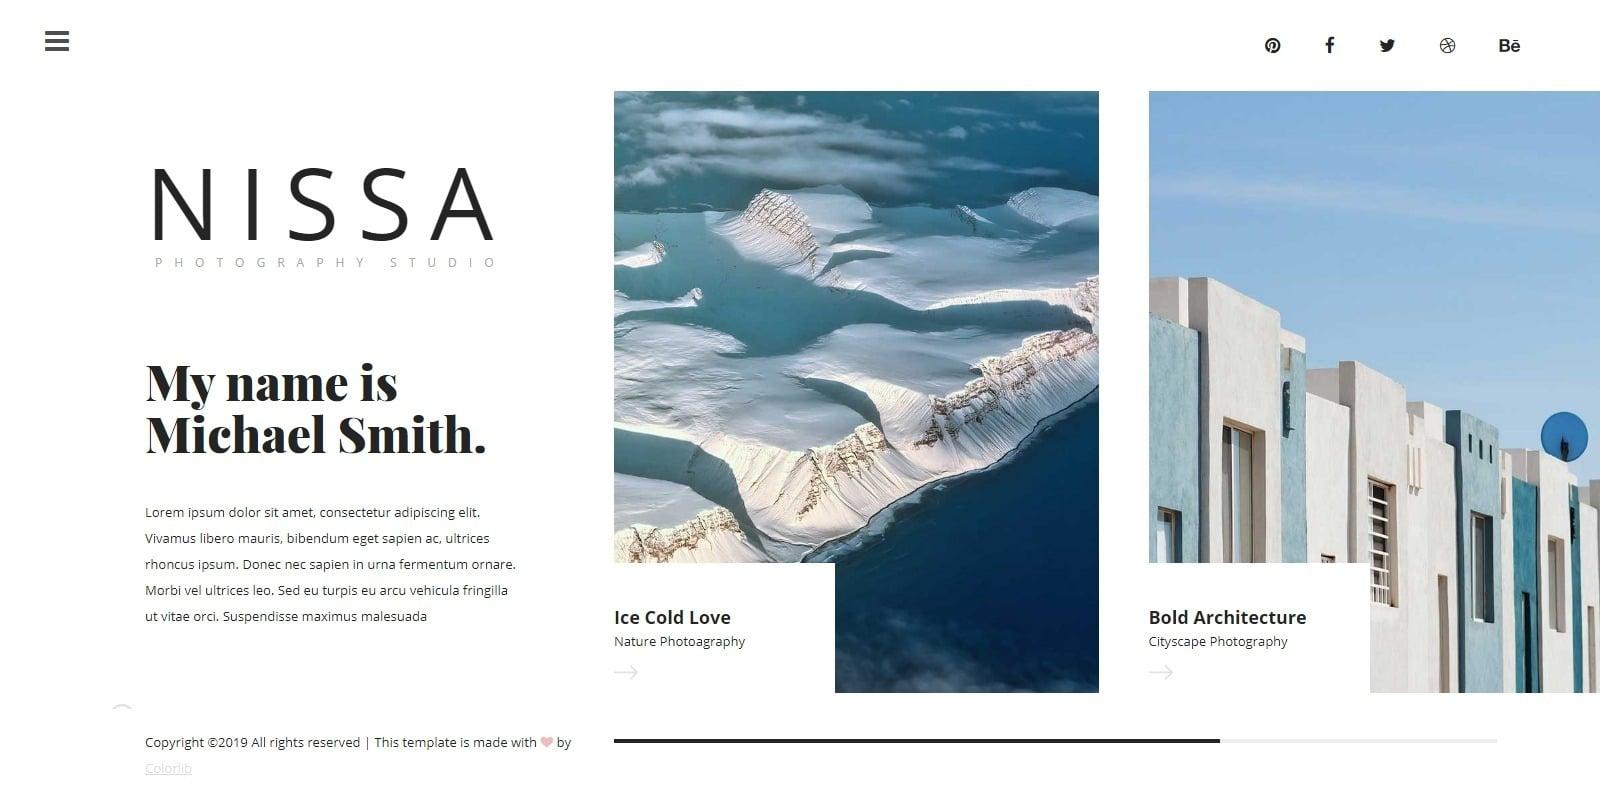 nissa-gallery-website-template